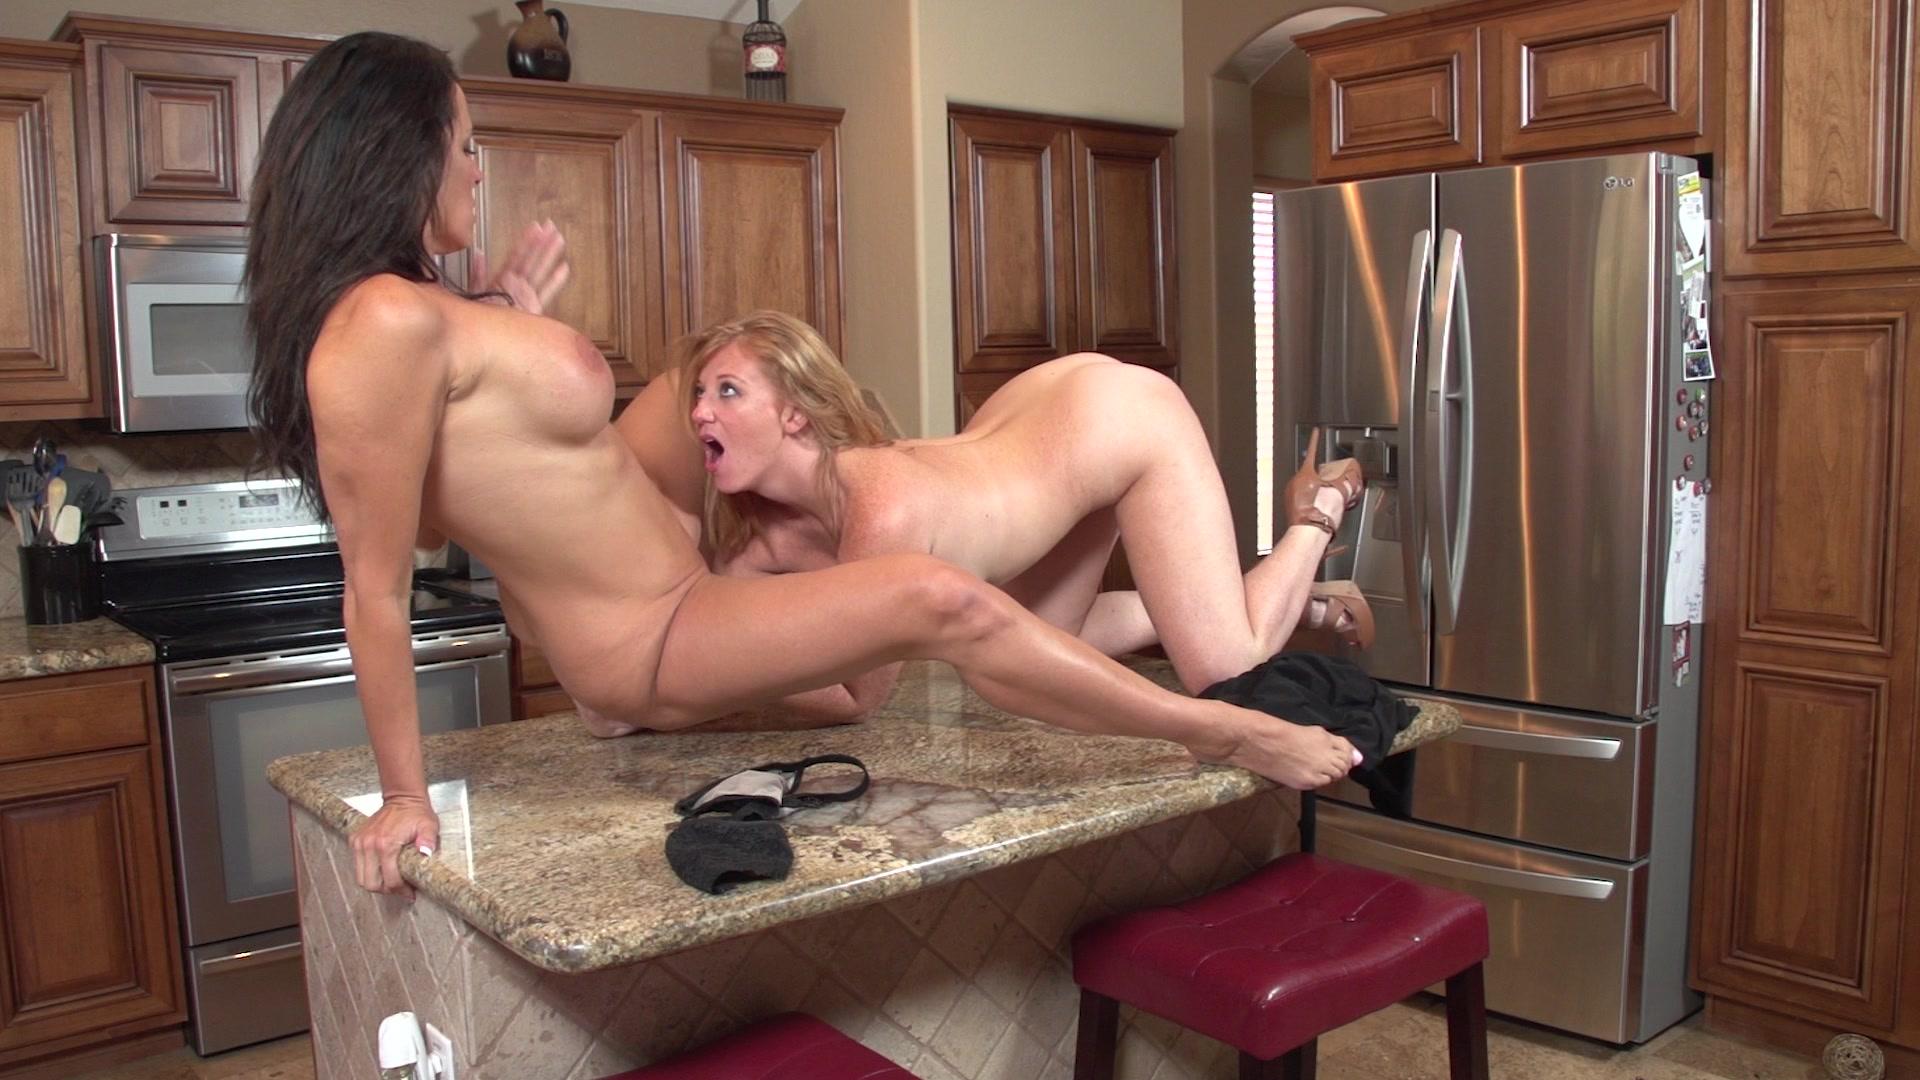 Lesbian sex at kitchen — img 13